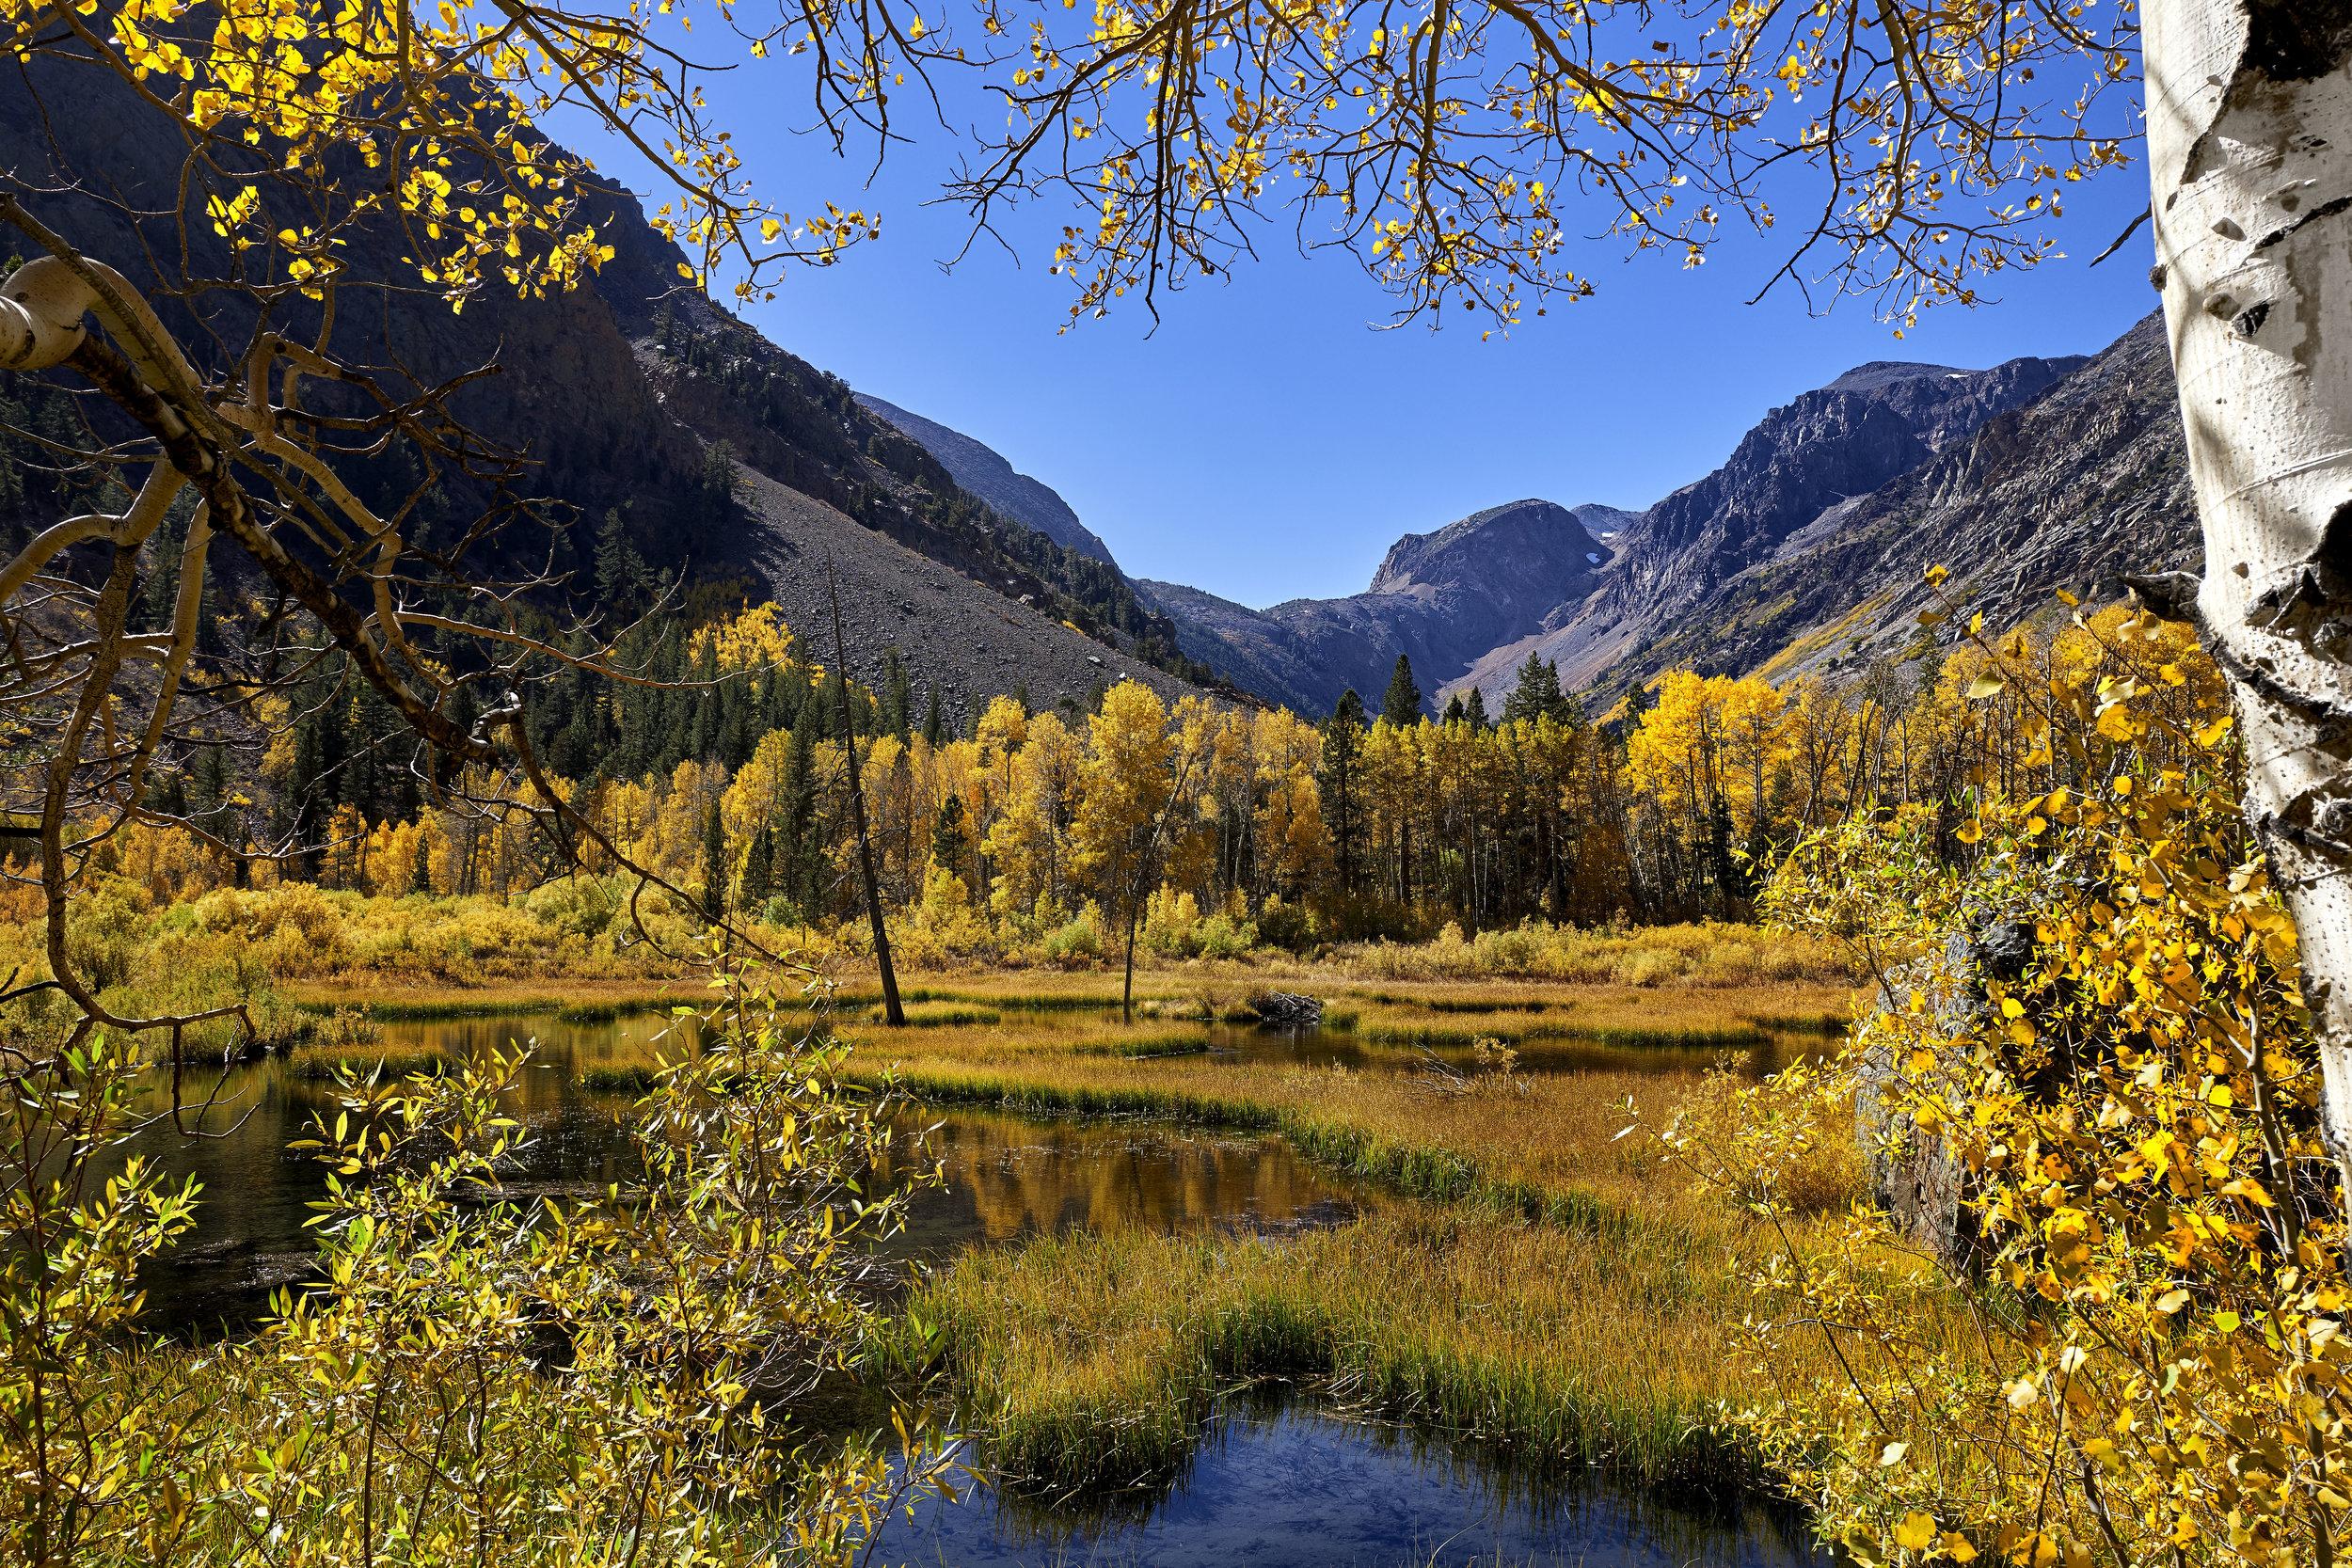 Fall Afternoon - Sierra Nevada Mountains, California